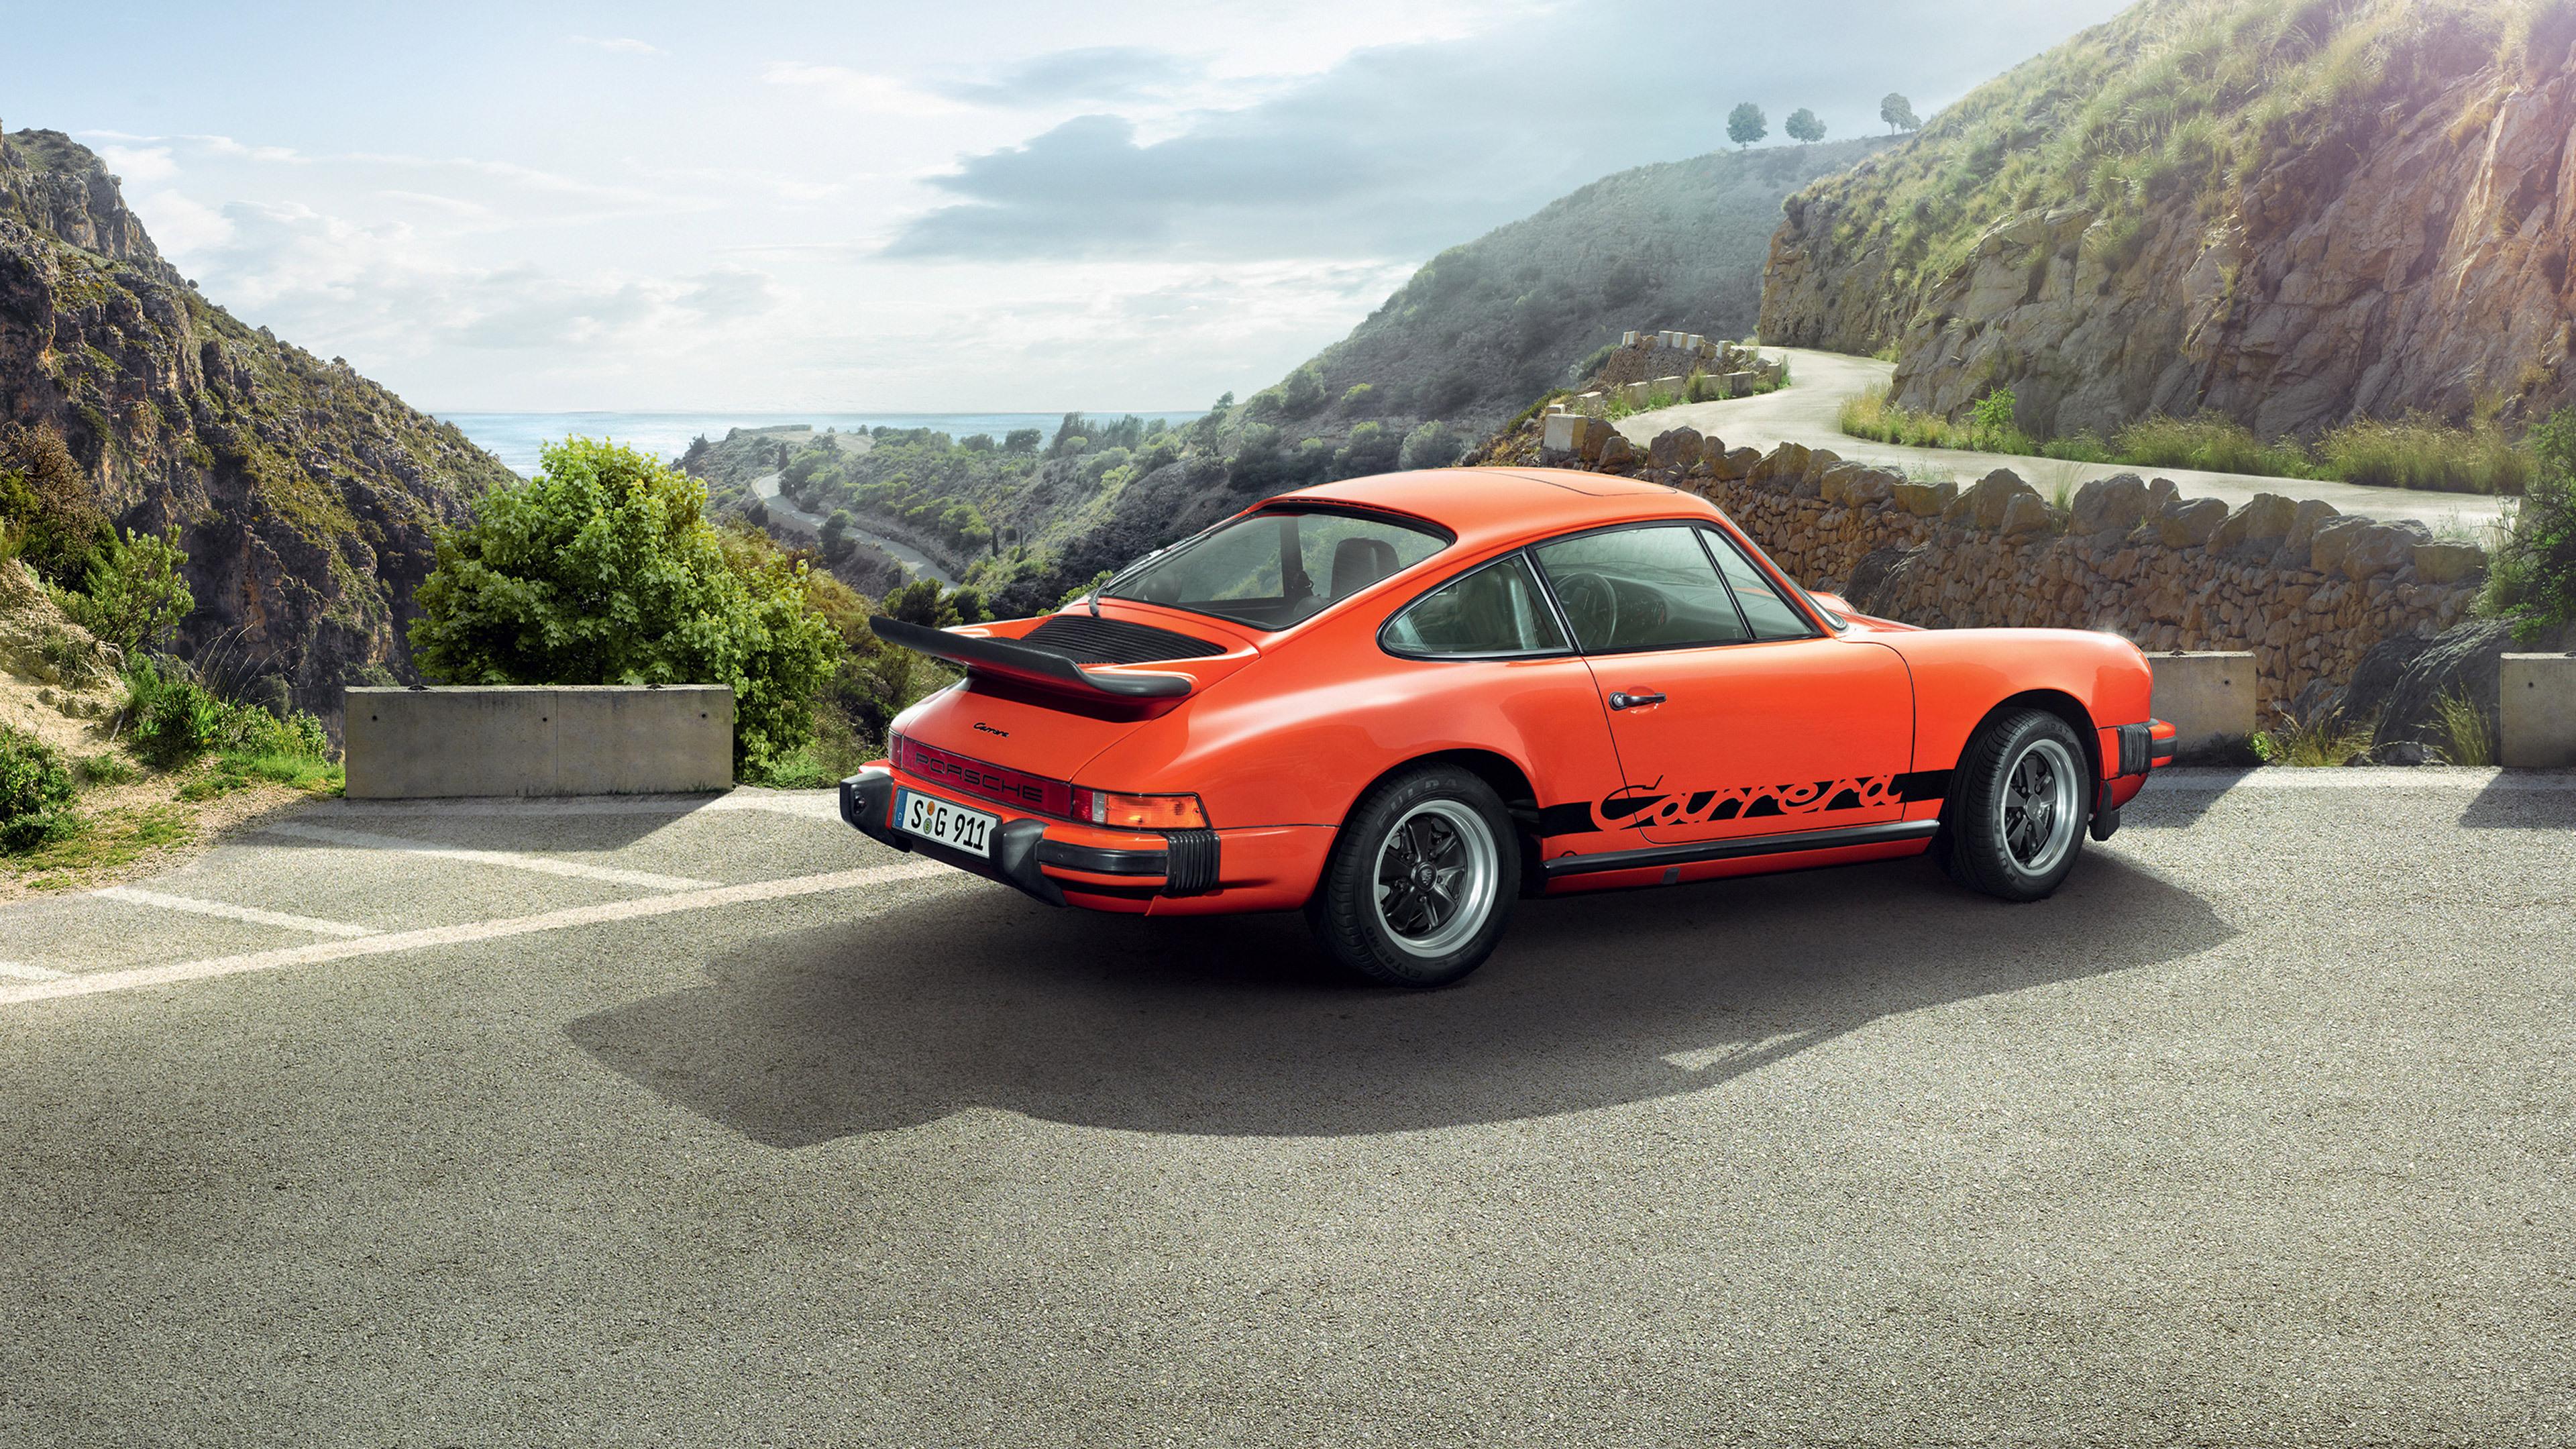 Porsche 911 Carrera дорога без смс